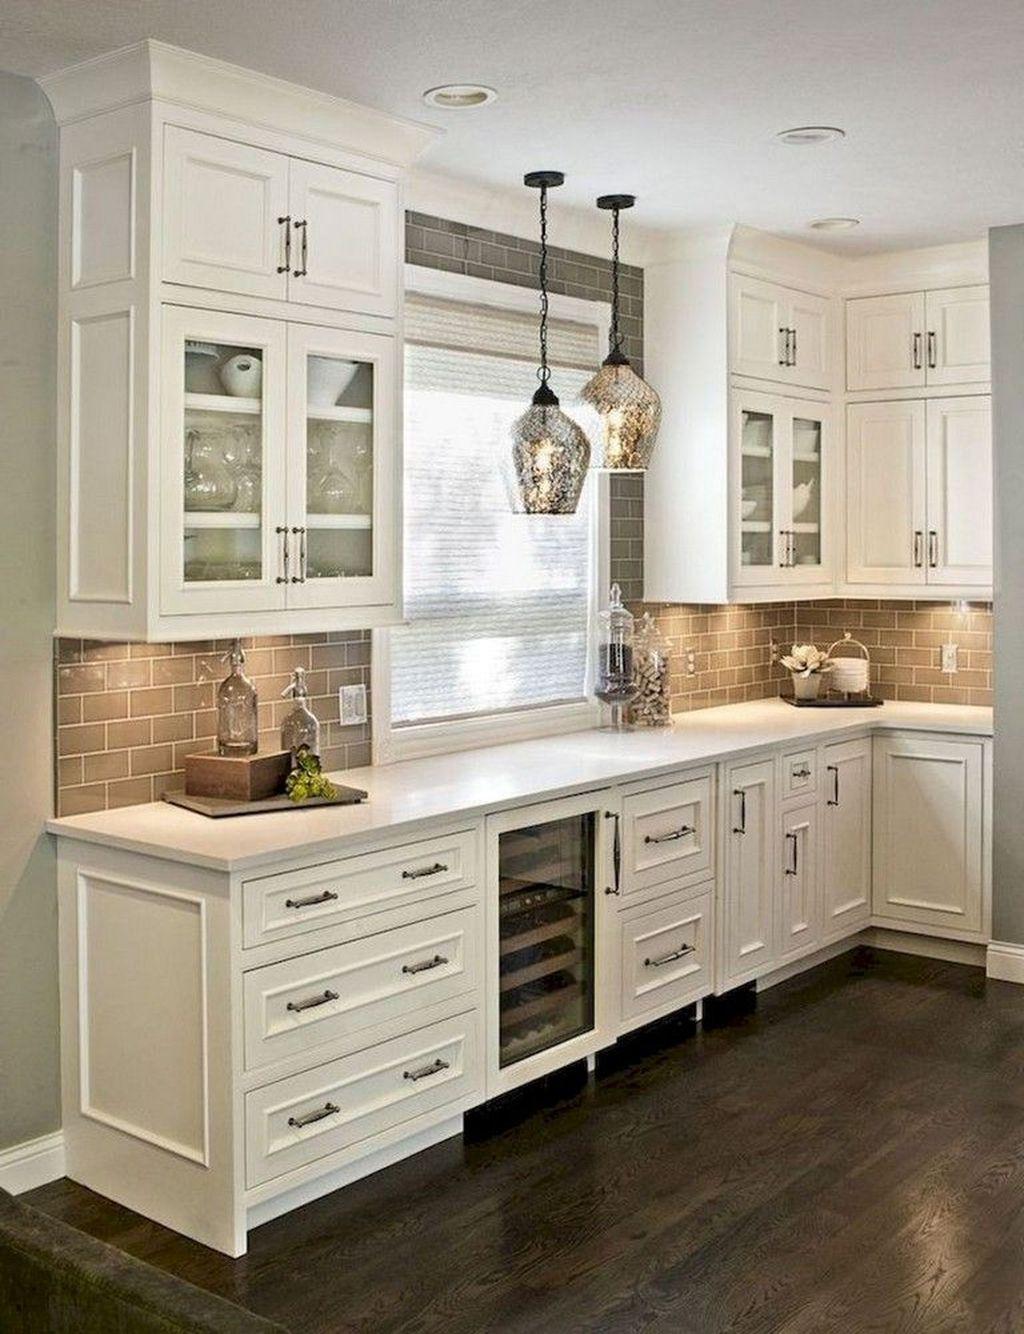 Fabulous Modern Rustic Kitchen Cabinets 09